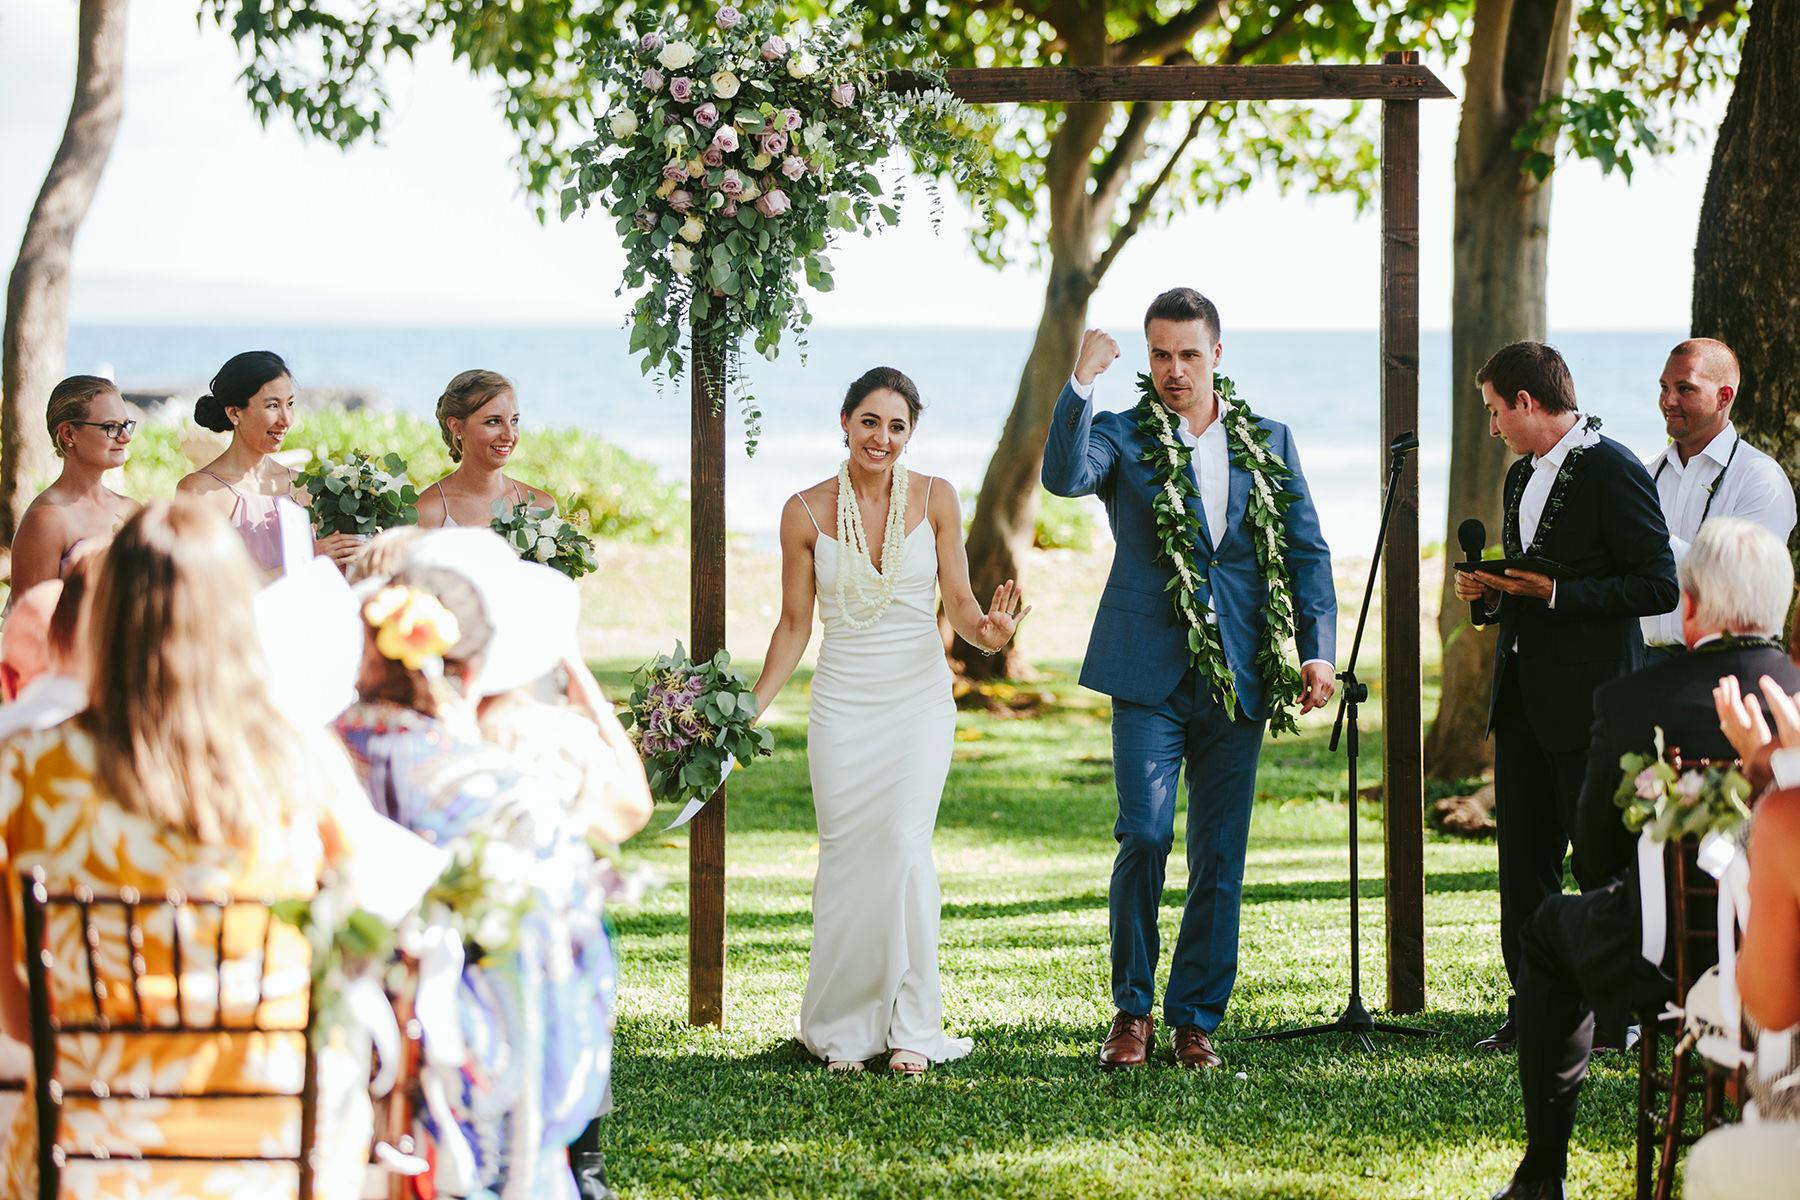 a bride and groom celebrate under their wedding arch at Olowalu Plantation House Maui